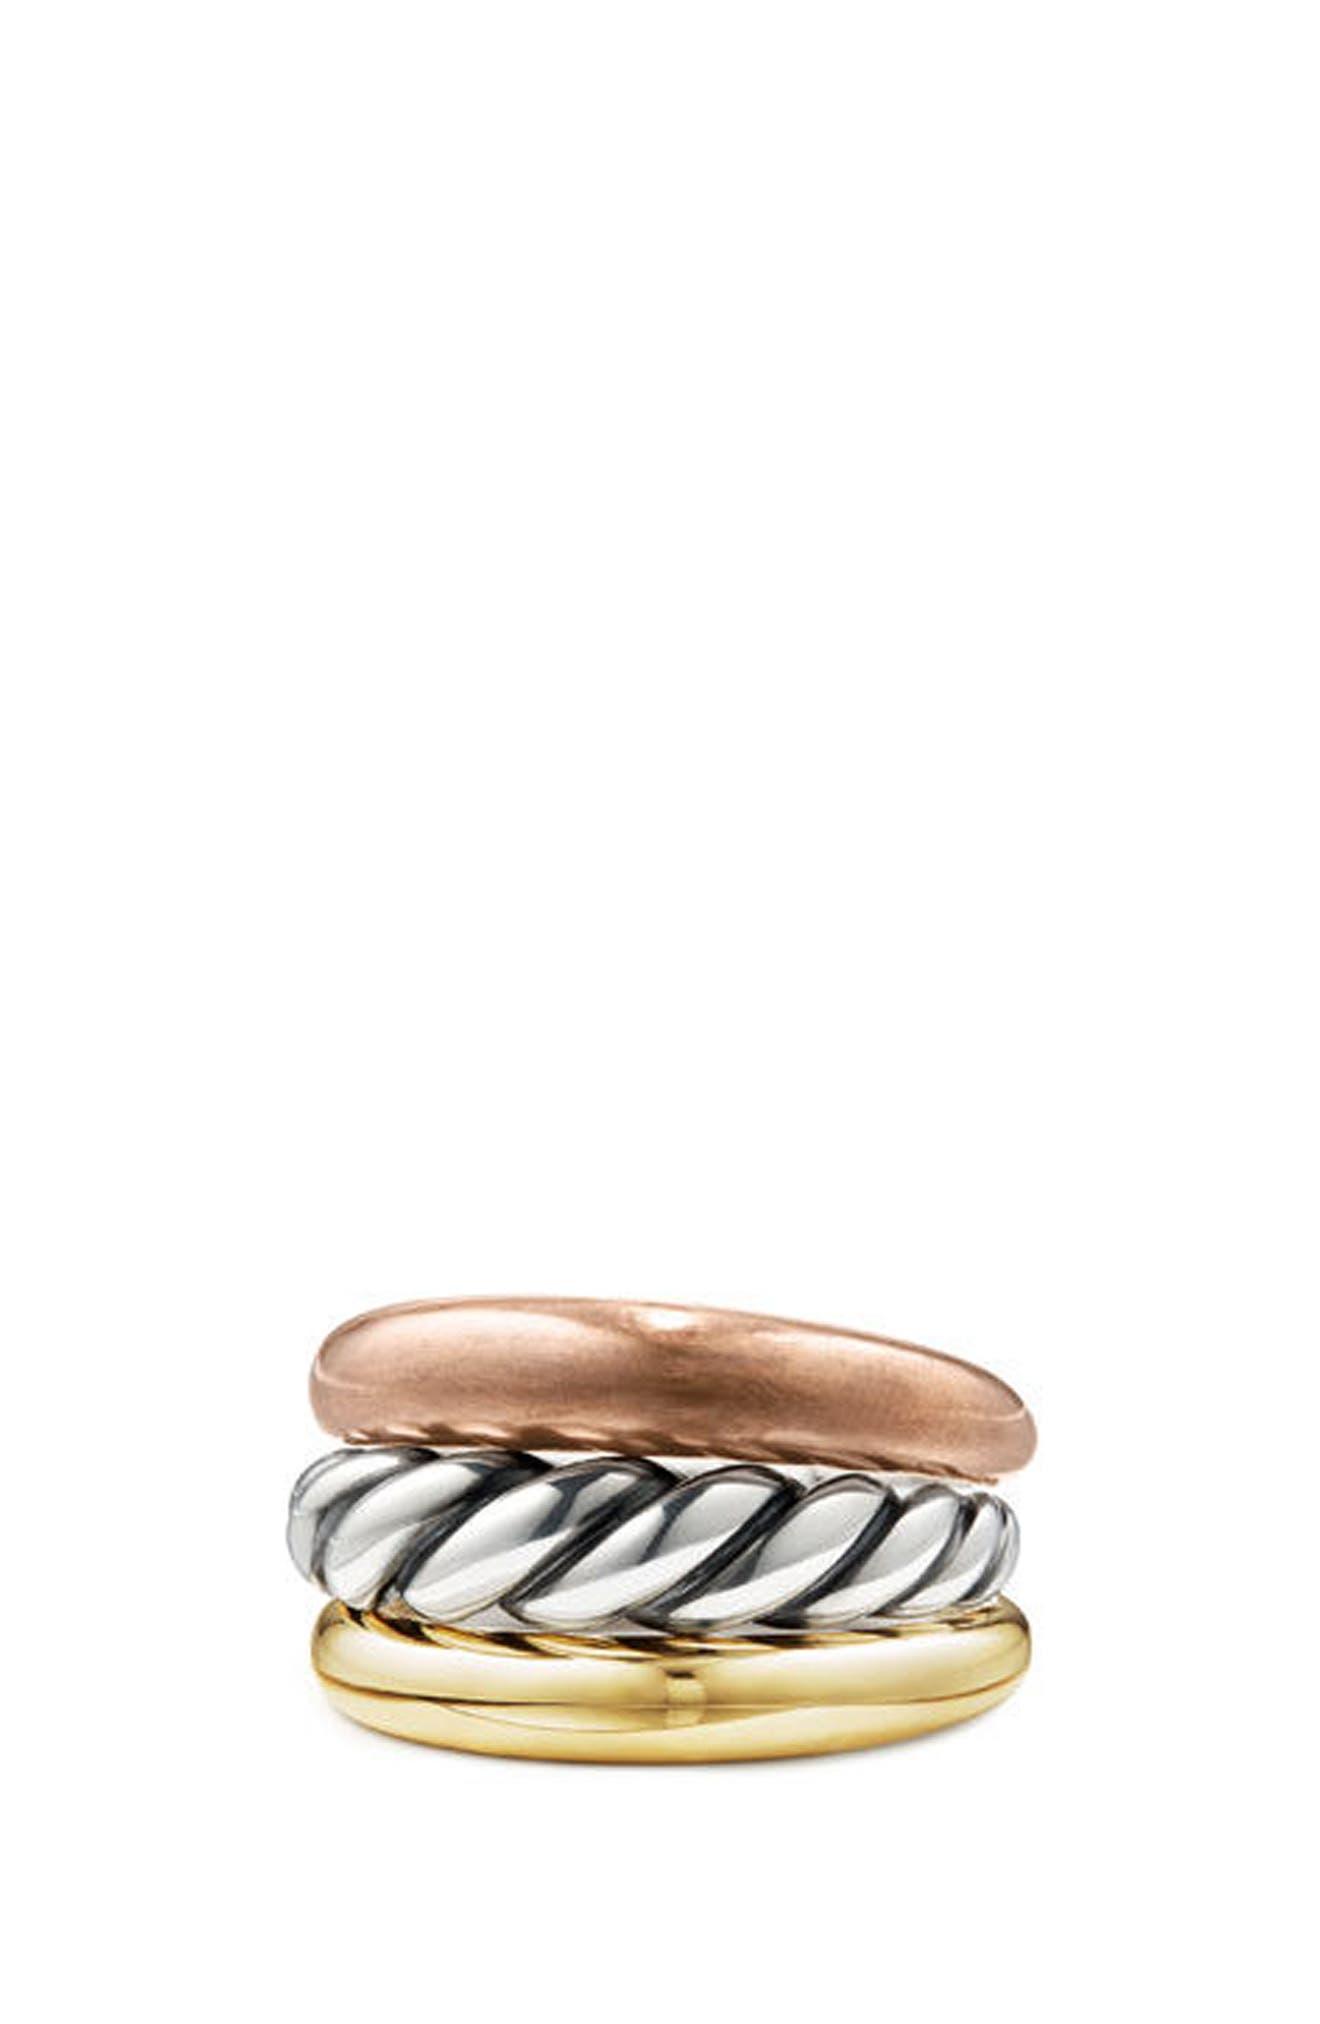 David Yurman Pure Form Mixed Metal Three-Row Ring with Bronze, Silver & Brass